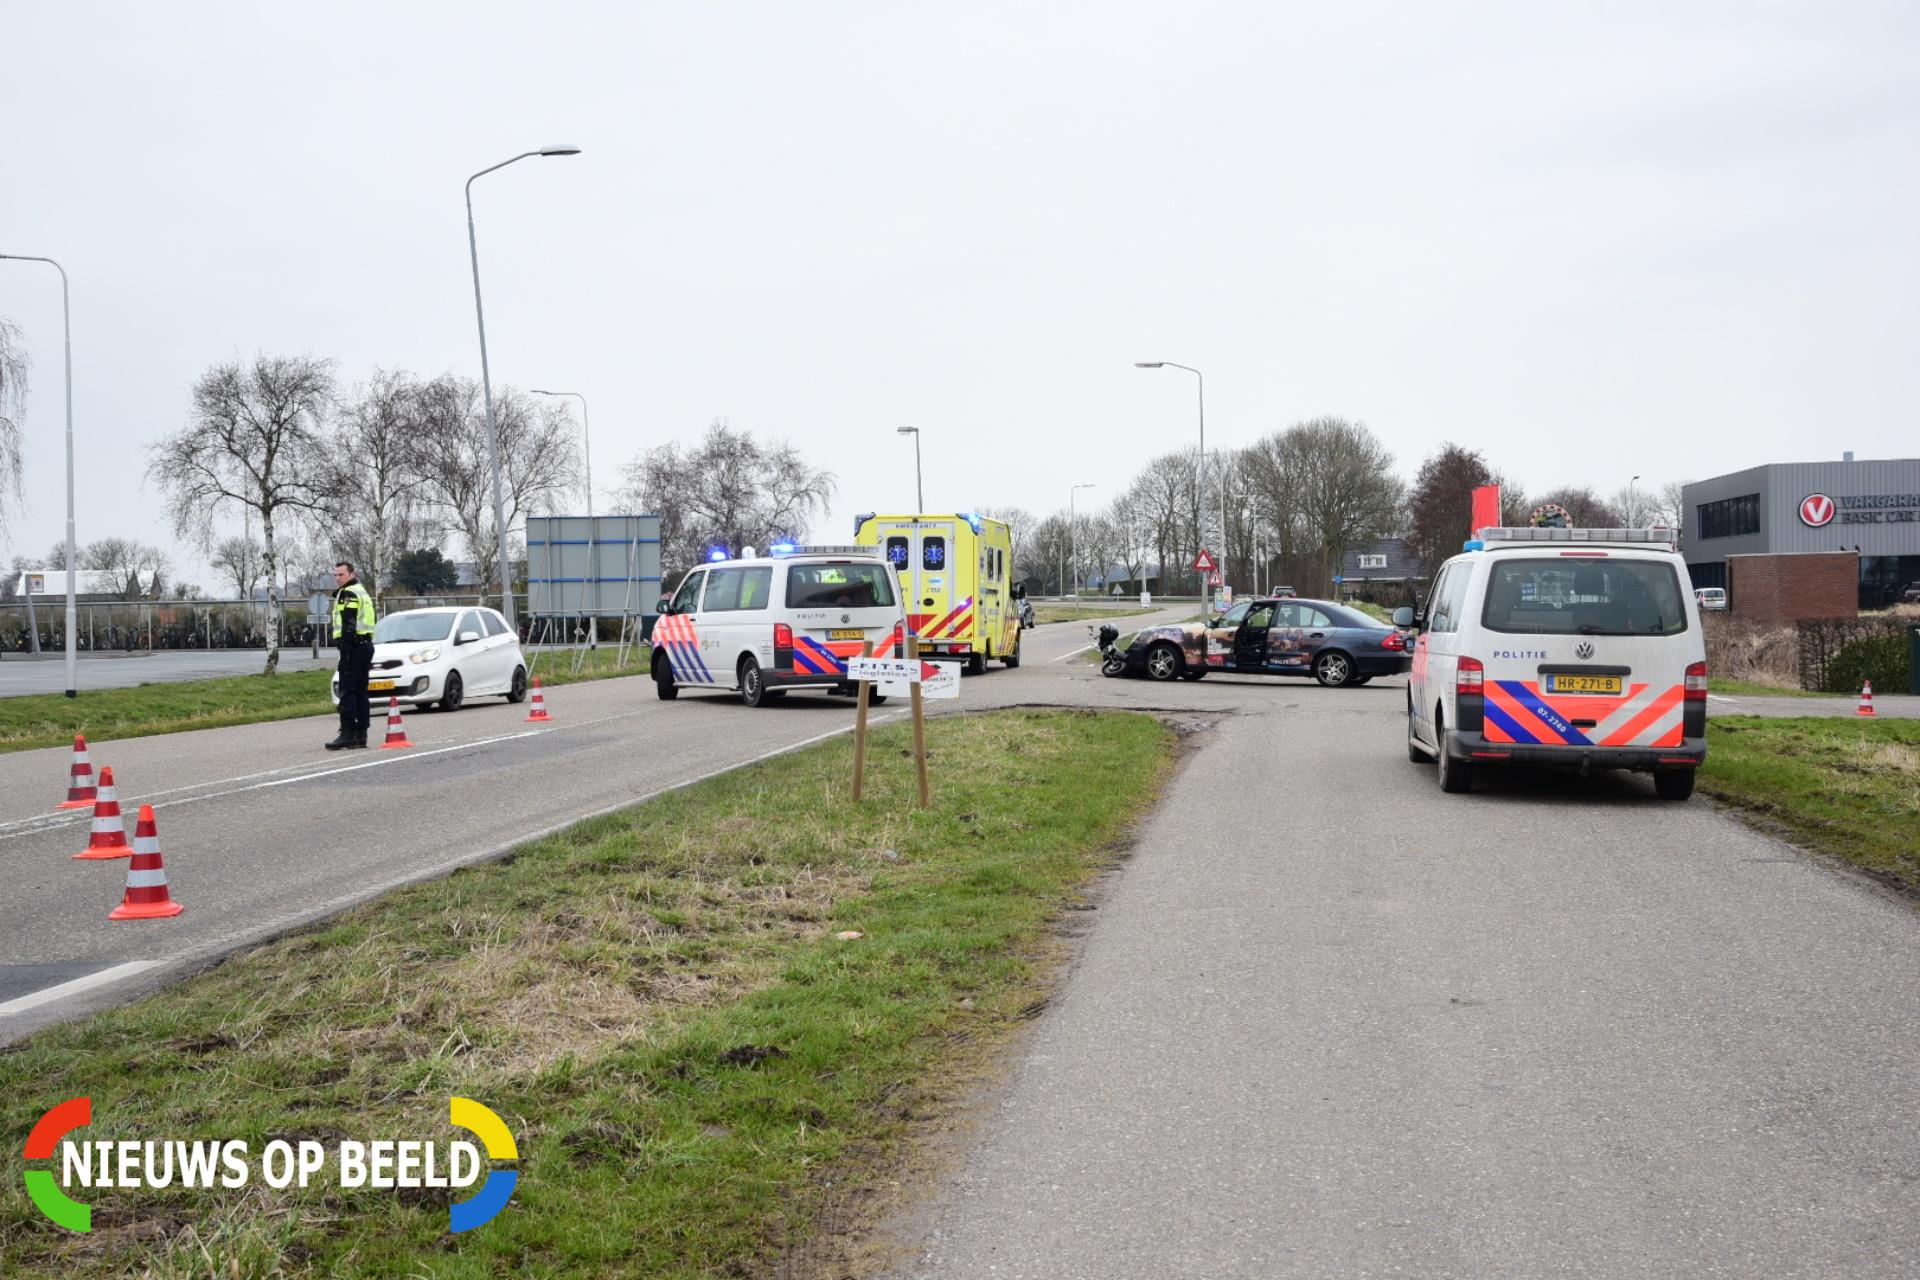 Scooterrijder gewond na botsing met taxi Reedijk Heinenoord